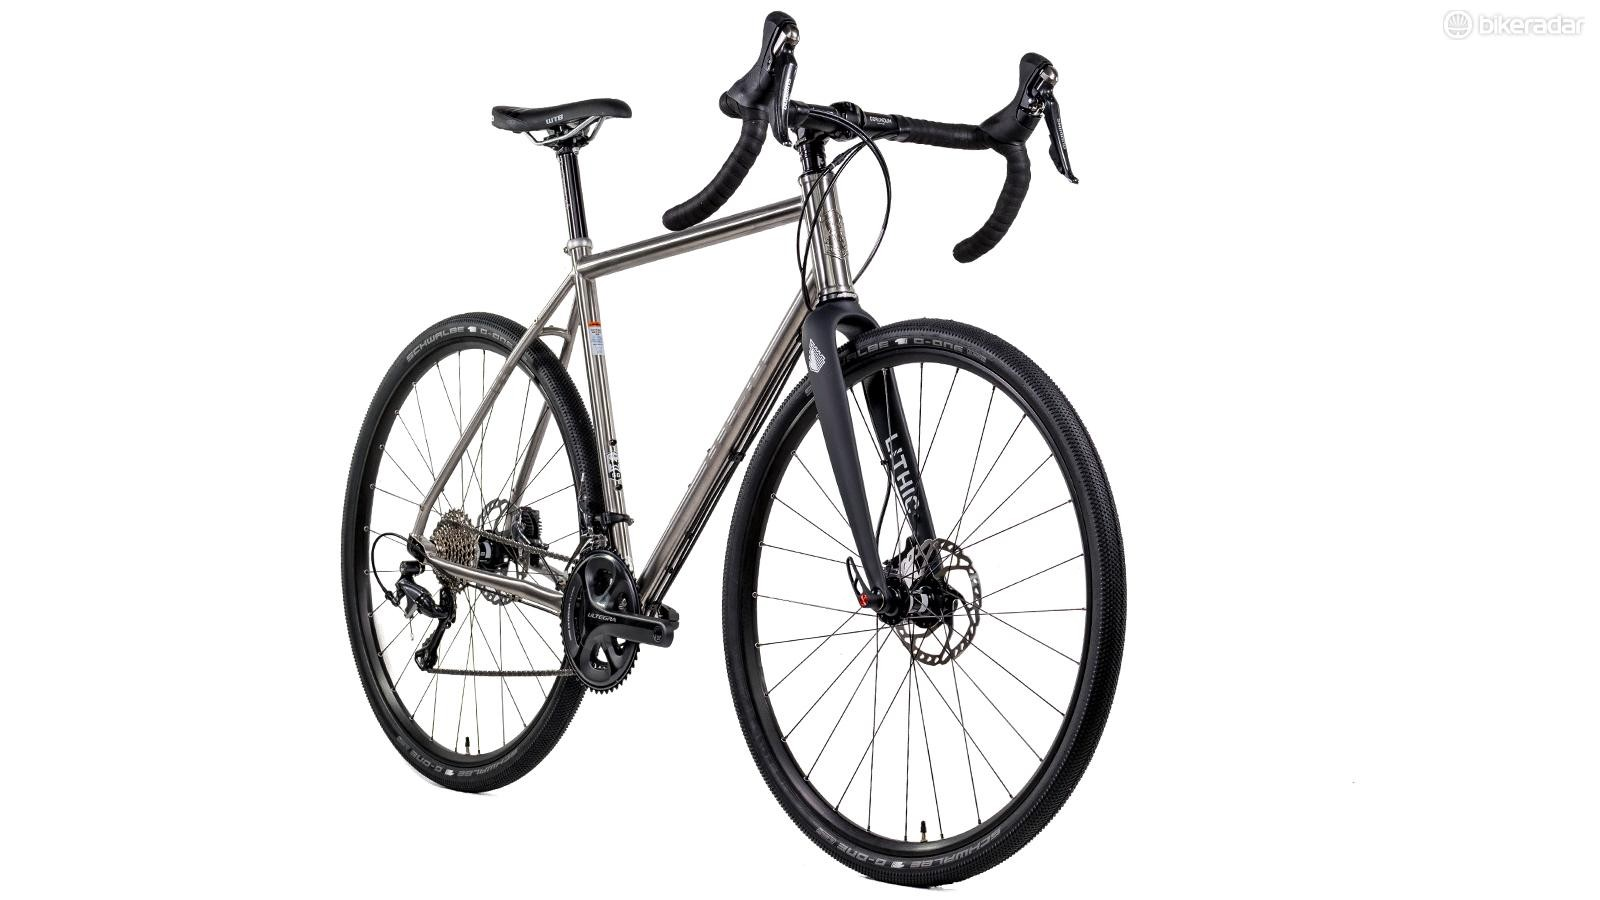 The Hiili carbon fork will come standard on the Otso Warakin gravel bike